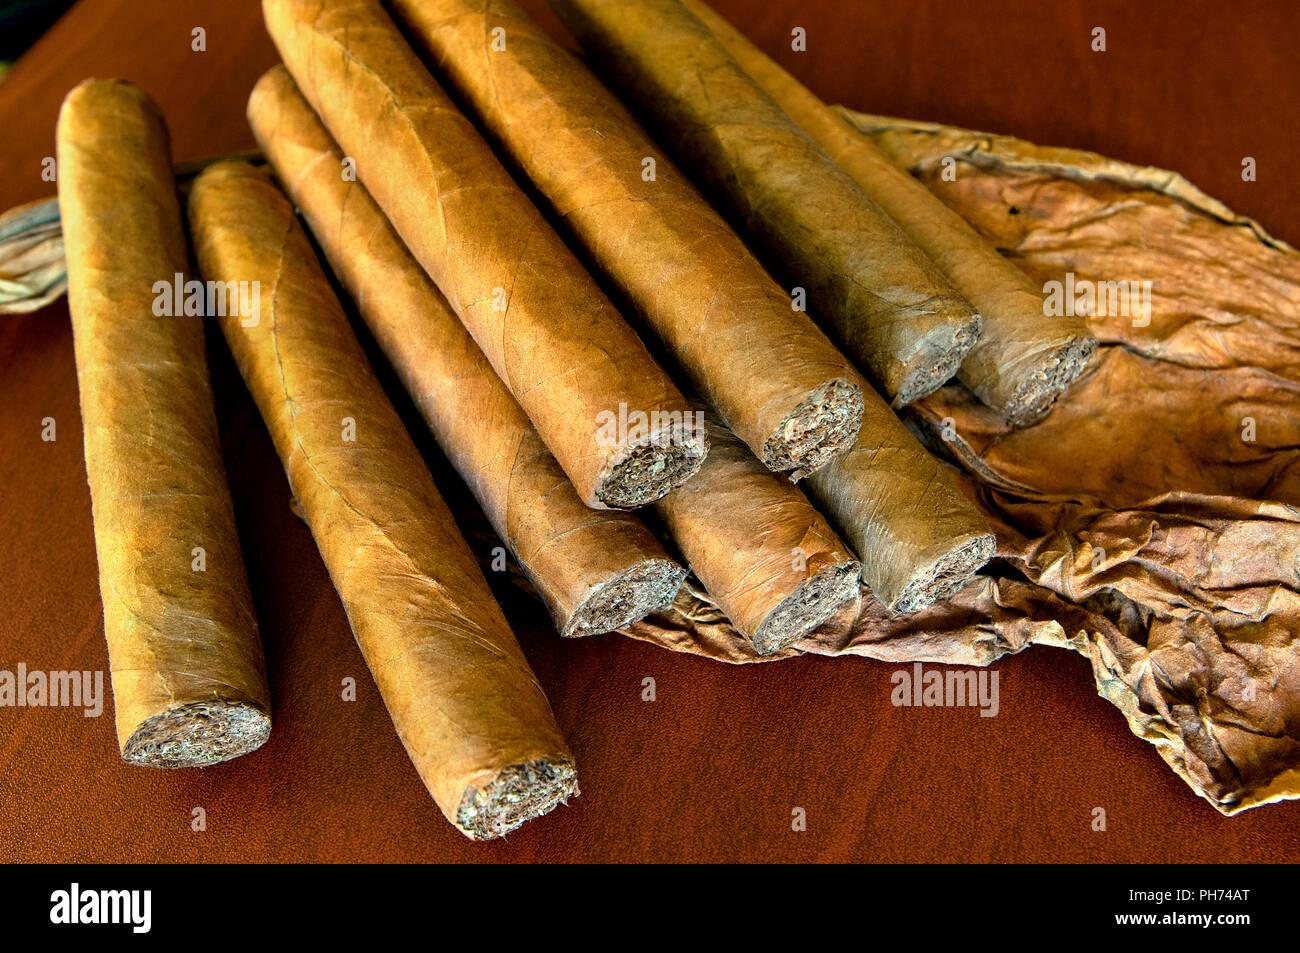 Kubanische Zigarren, Kuba Stockbild